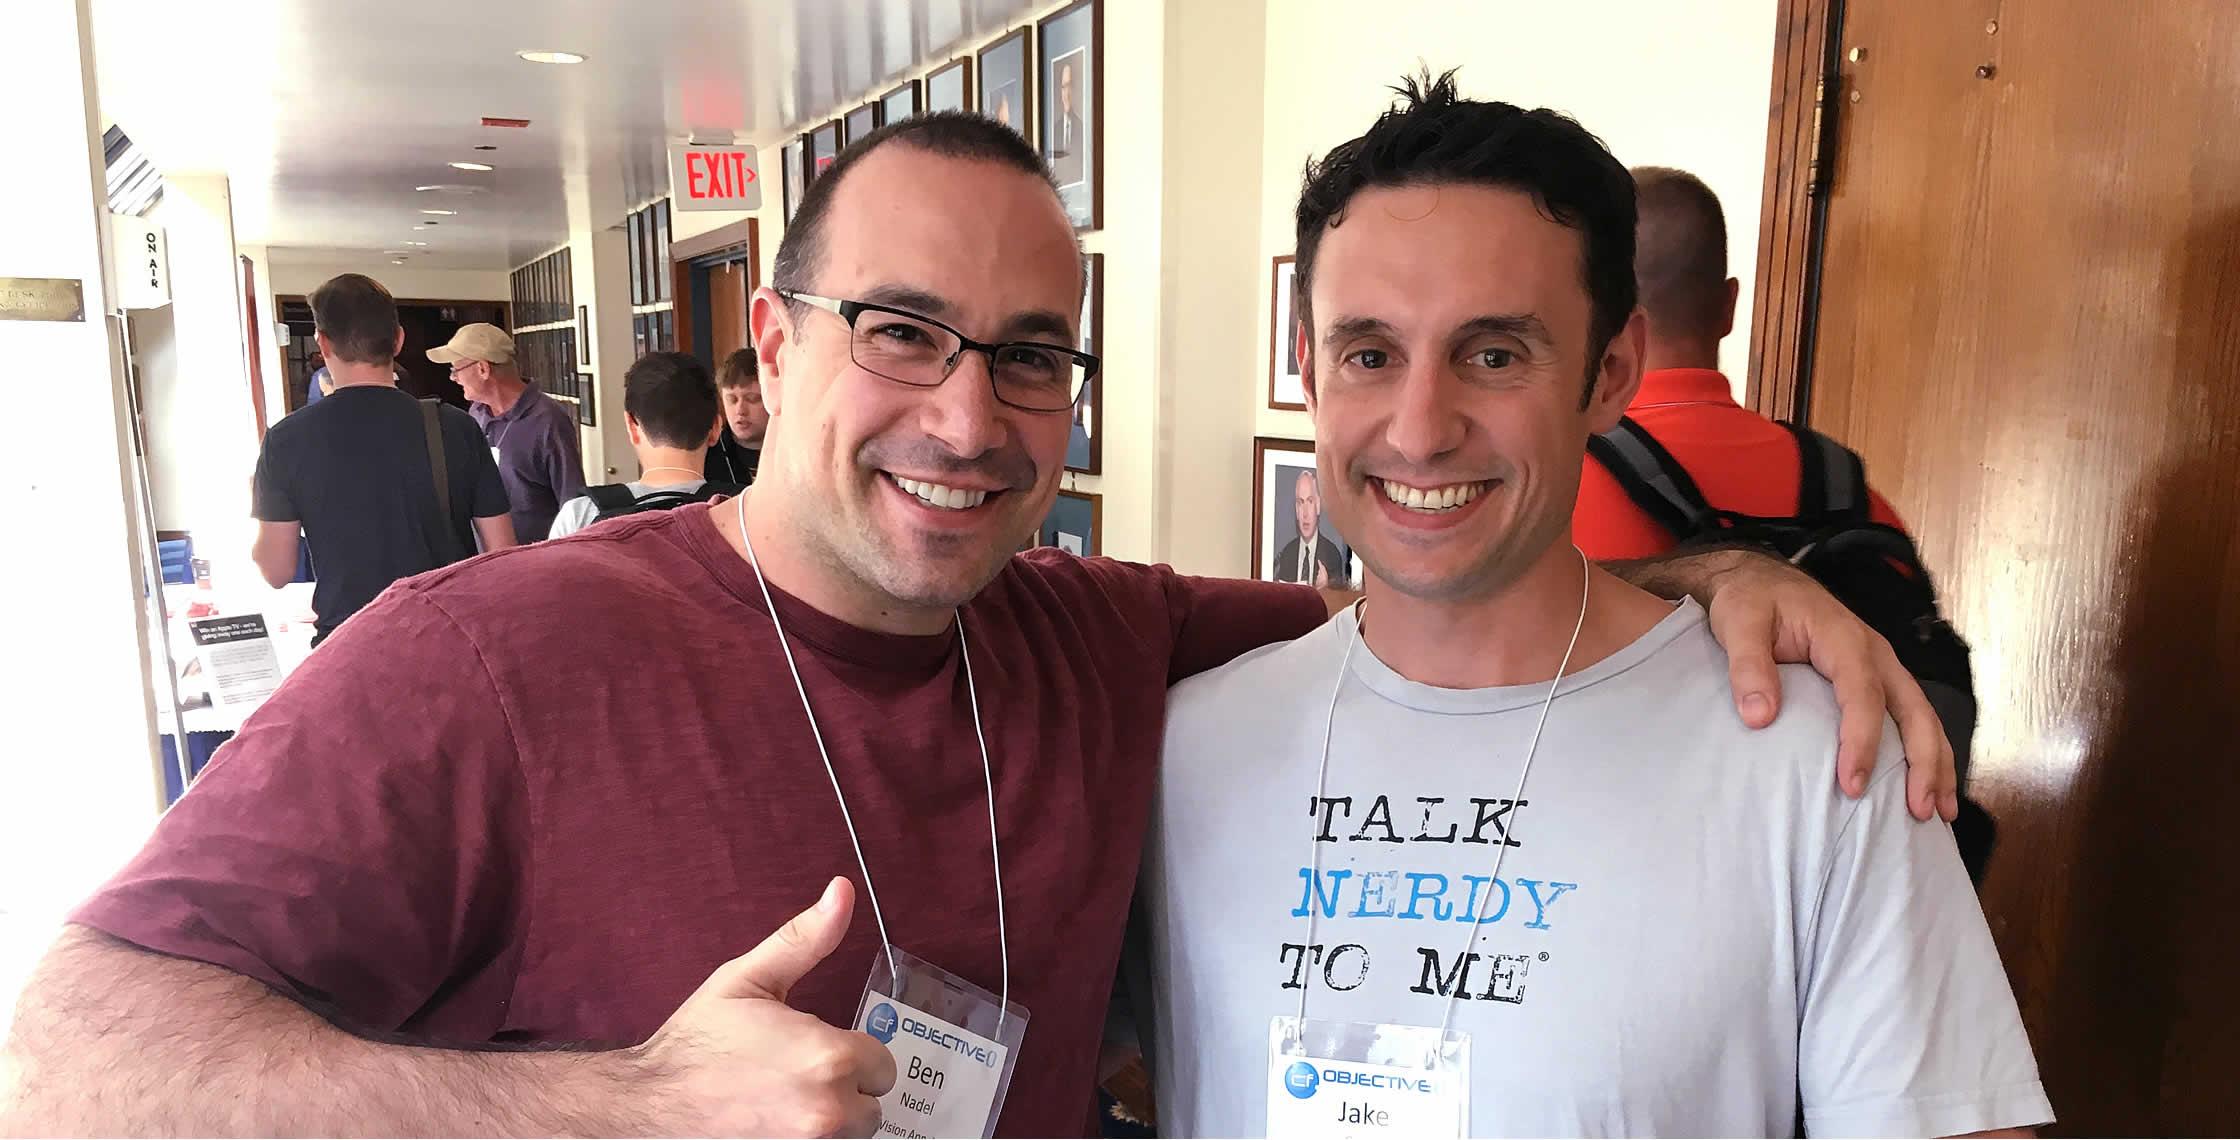 Ben Nadel at cf.Objective() 2017 (Washington, D.C.) with: Jake Scott